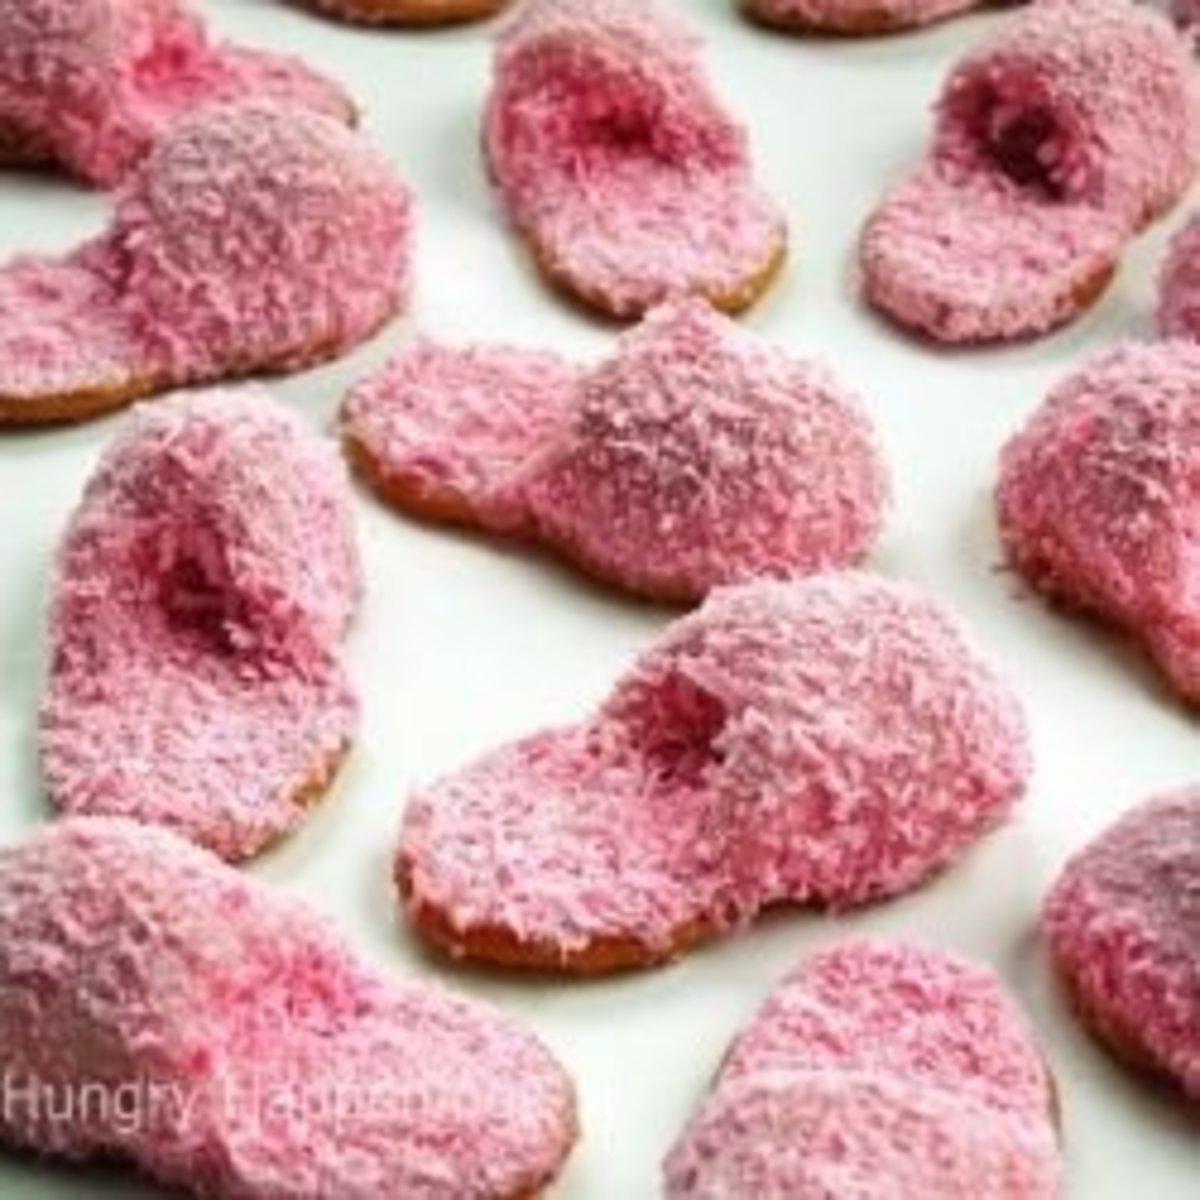 Pajama slipper cookies